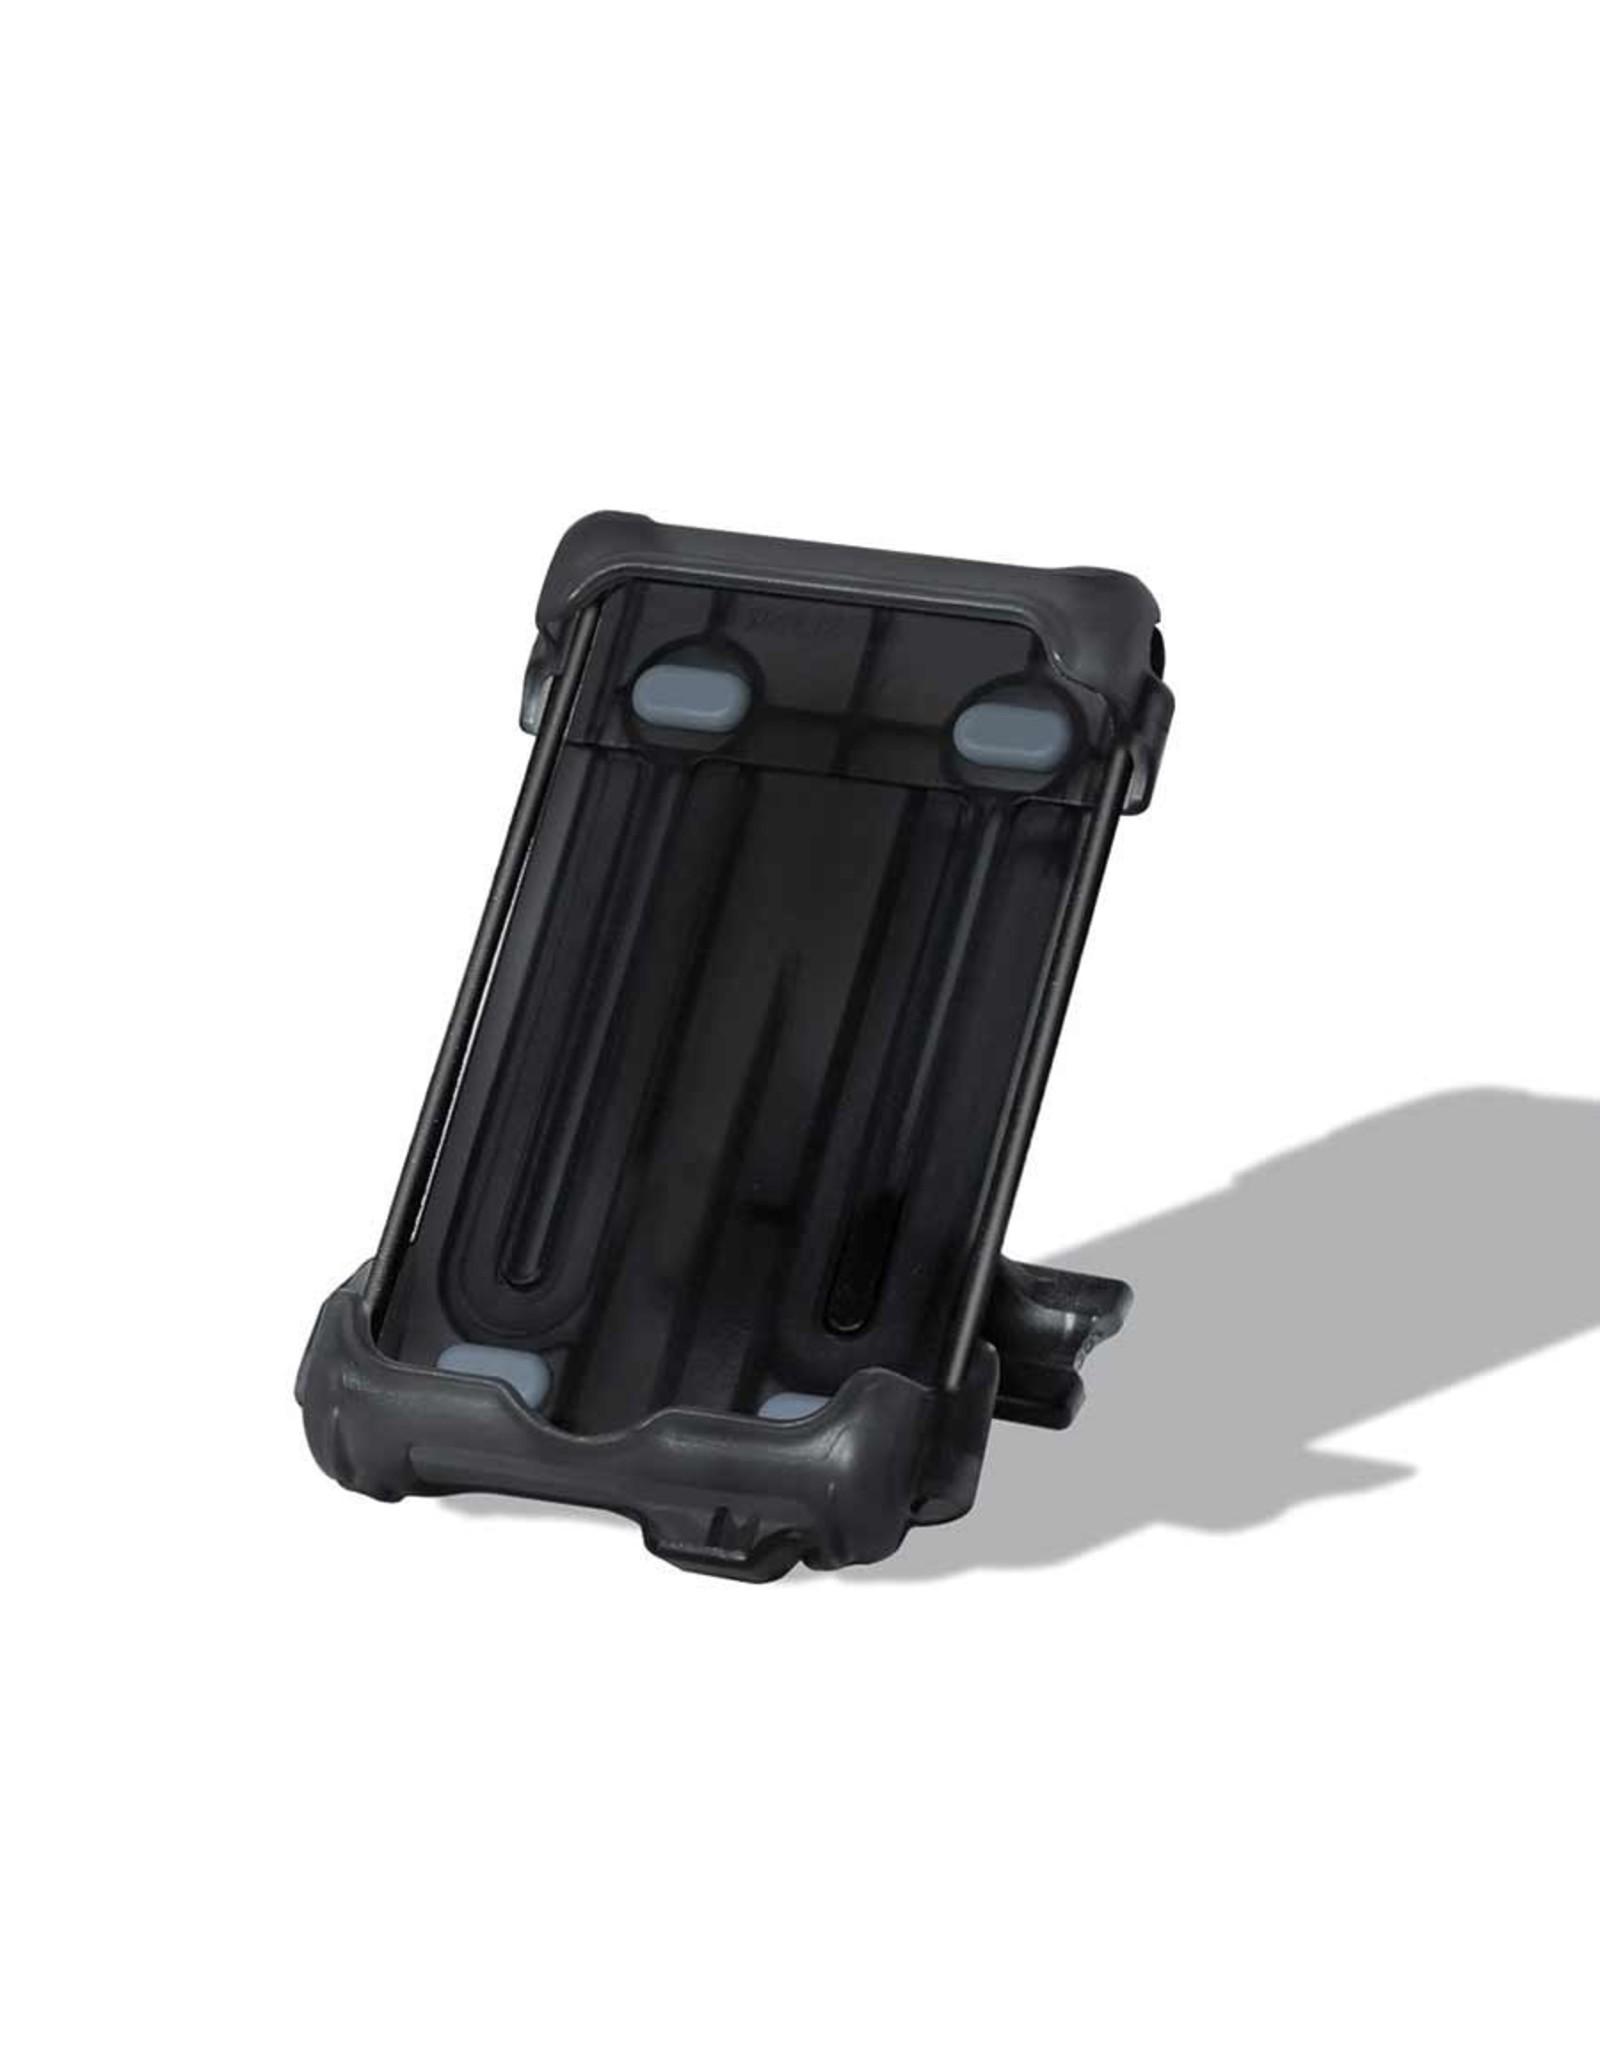 Delta Delta smartphone Caddy 2 phone holder